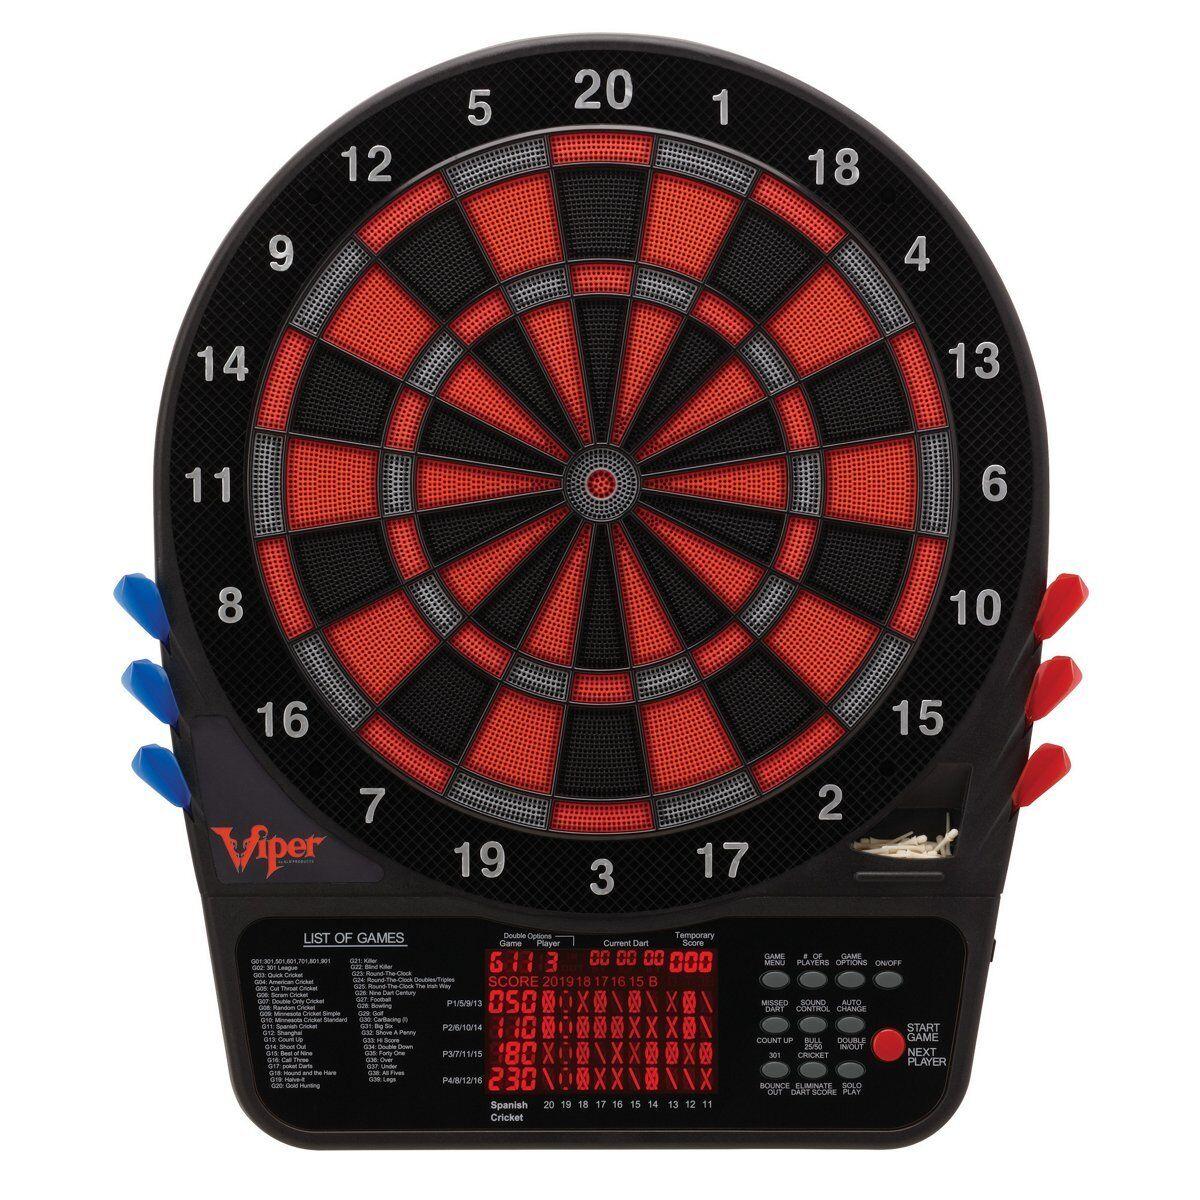 Viper 800 Electronic Soft Tip Dartboard, Item 42-1034, NEW, Open Box